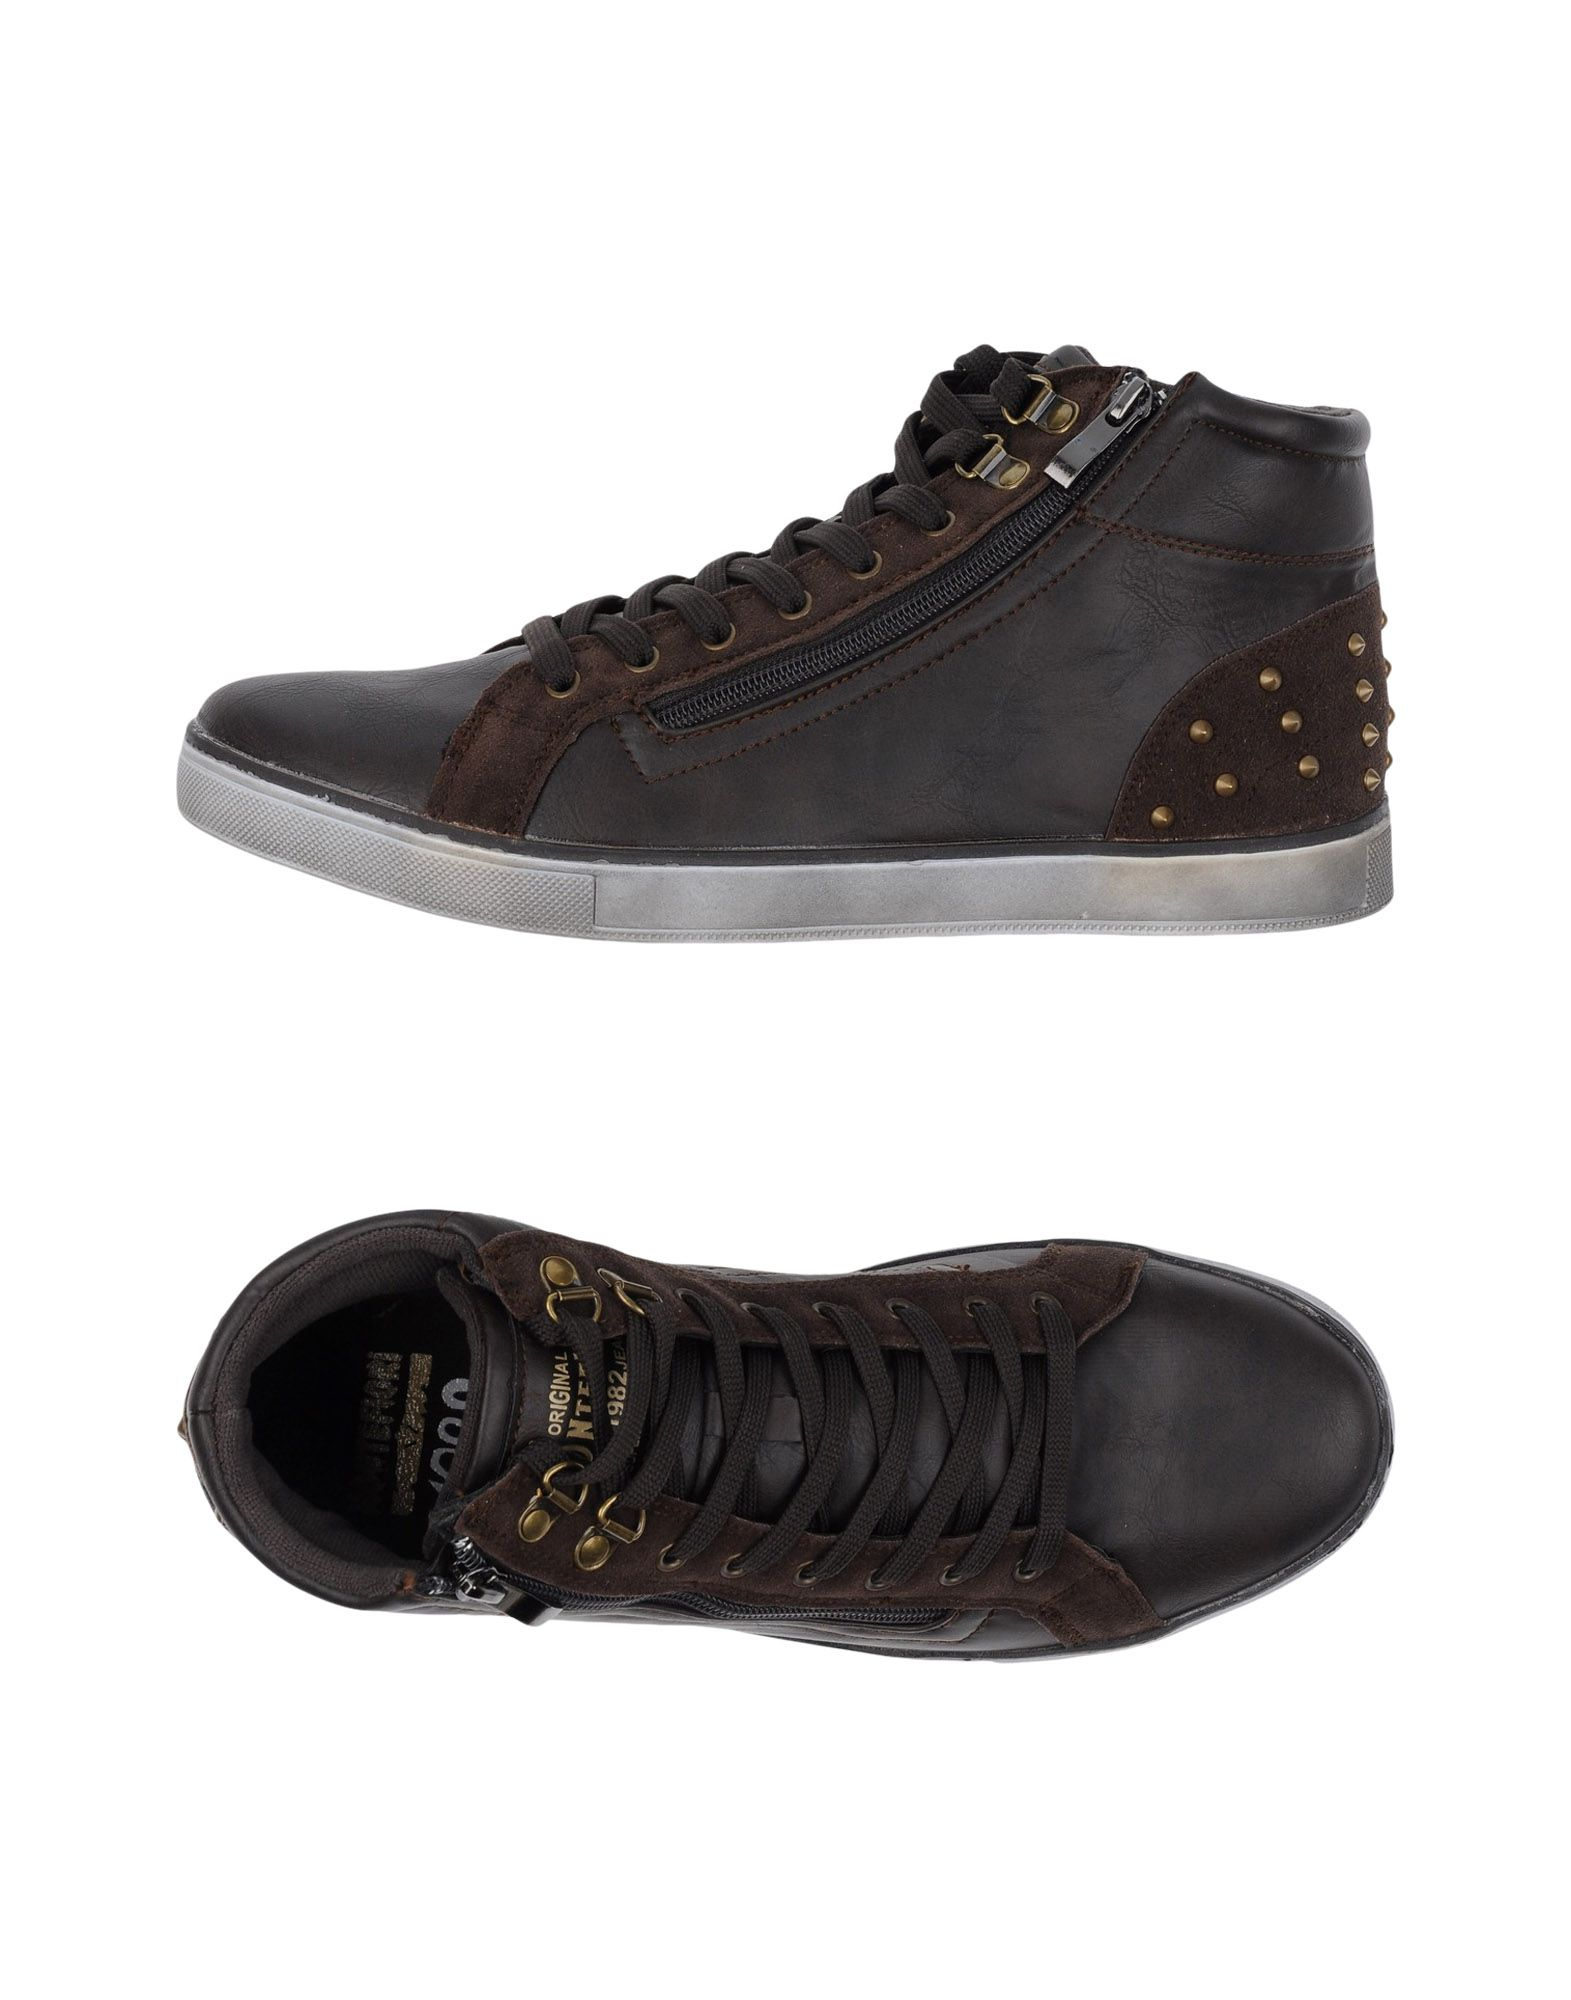 MONTEFIORI Высокие кеды и кроссовки кеды кроссовки высокие dc council mid tx stone camo